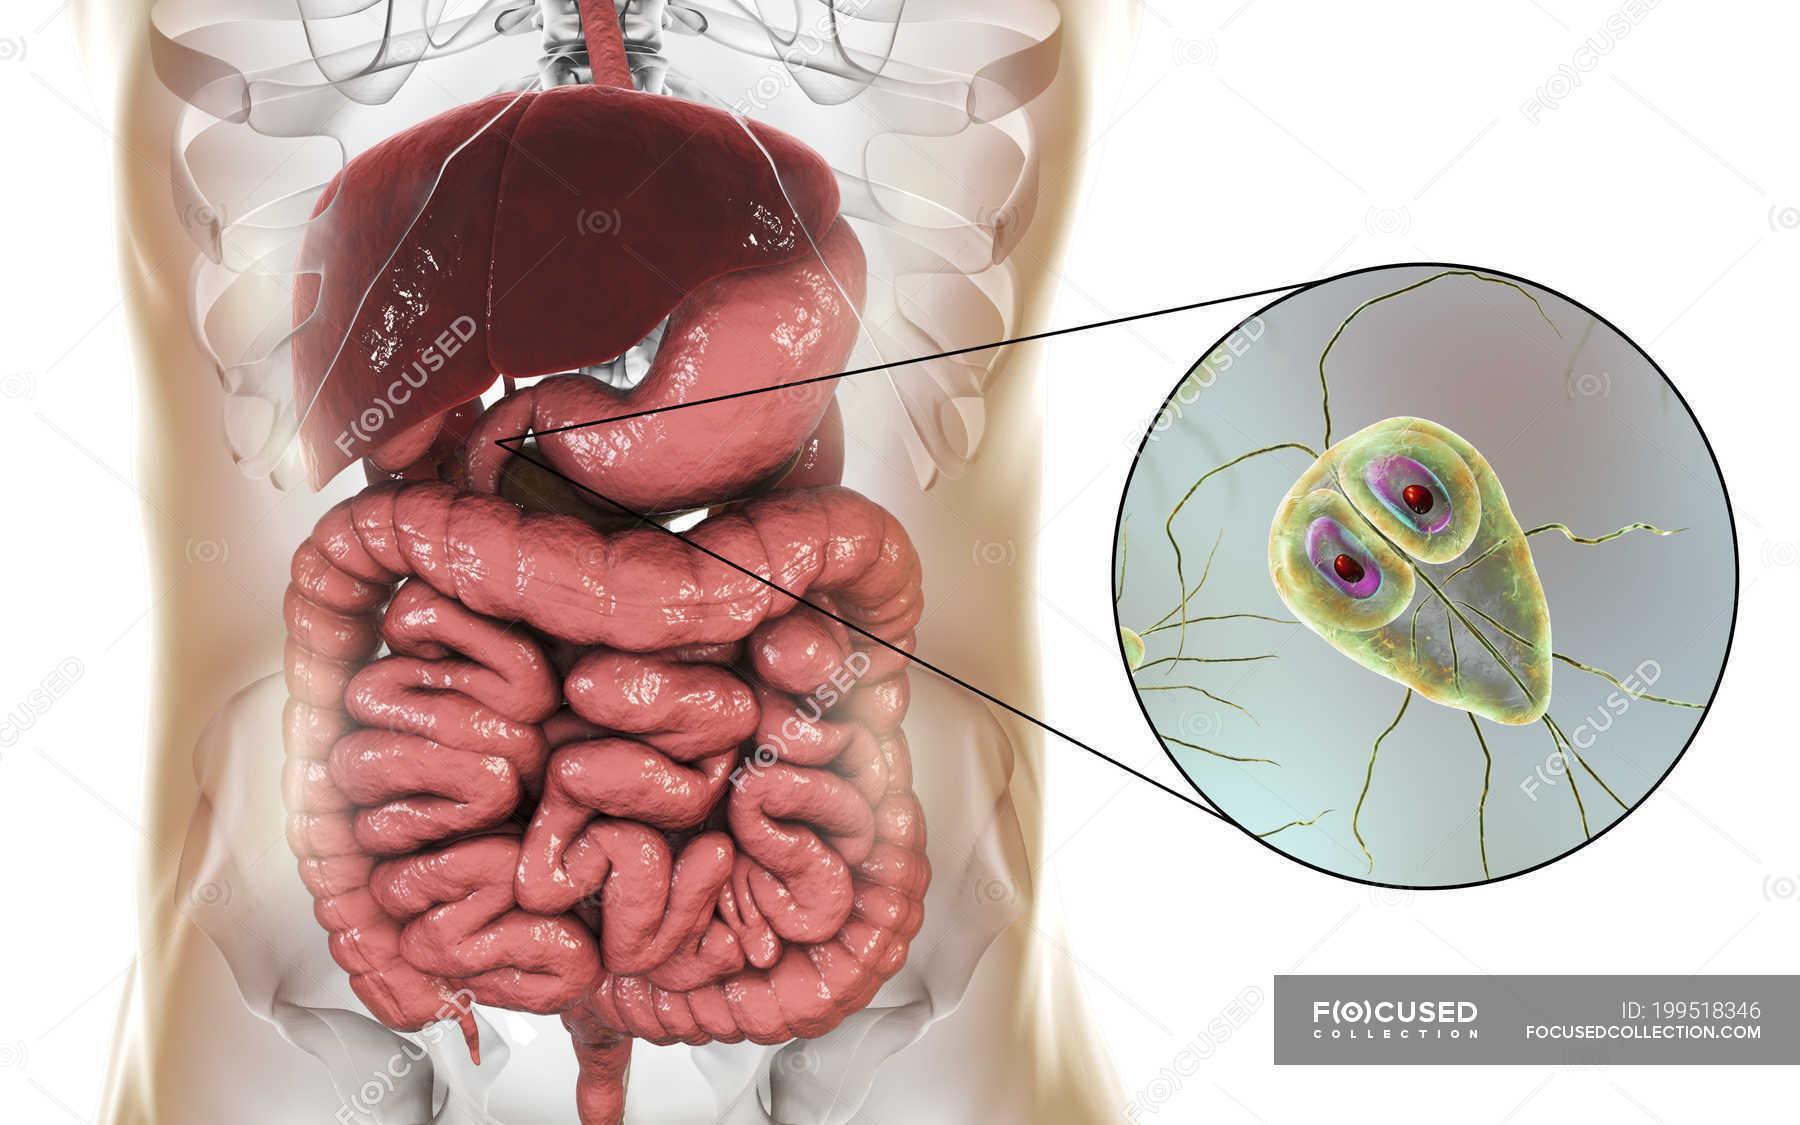 Parazitozele intestinale: giardioza si ascaridioza | fgscs.ro